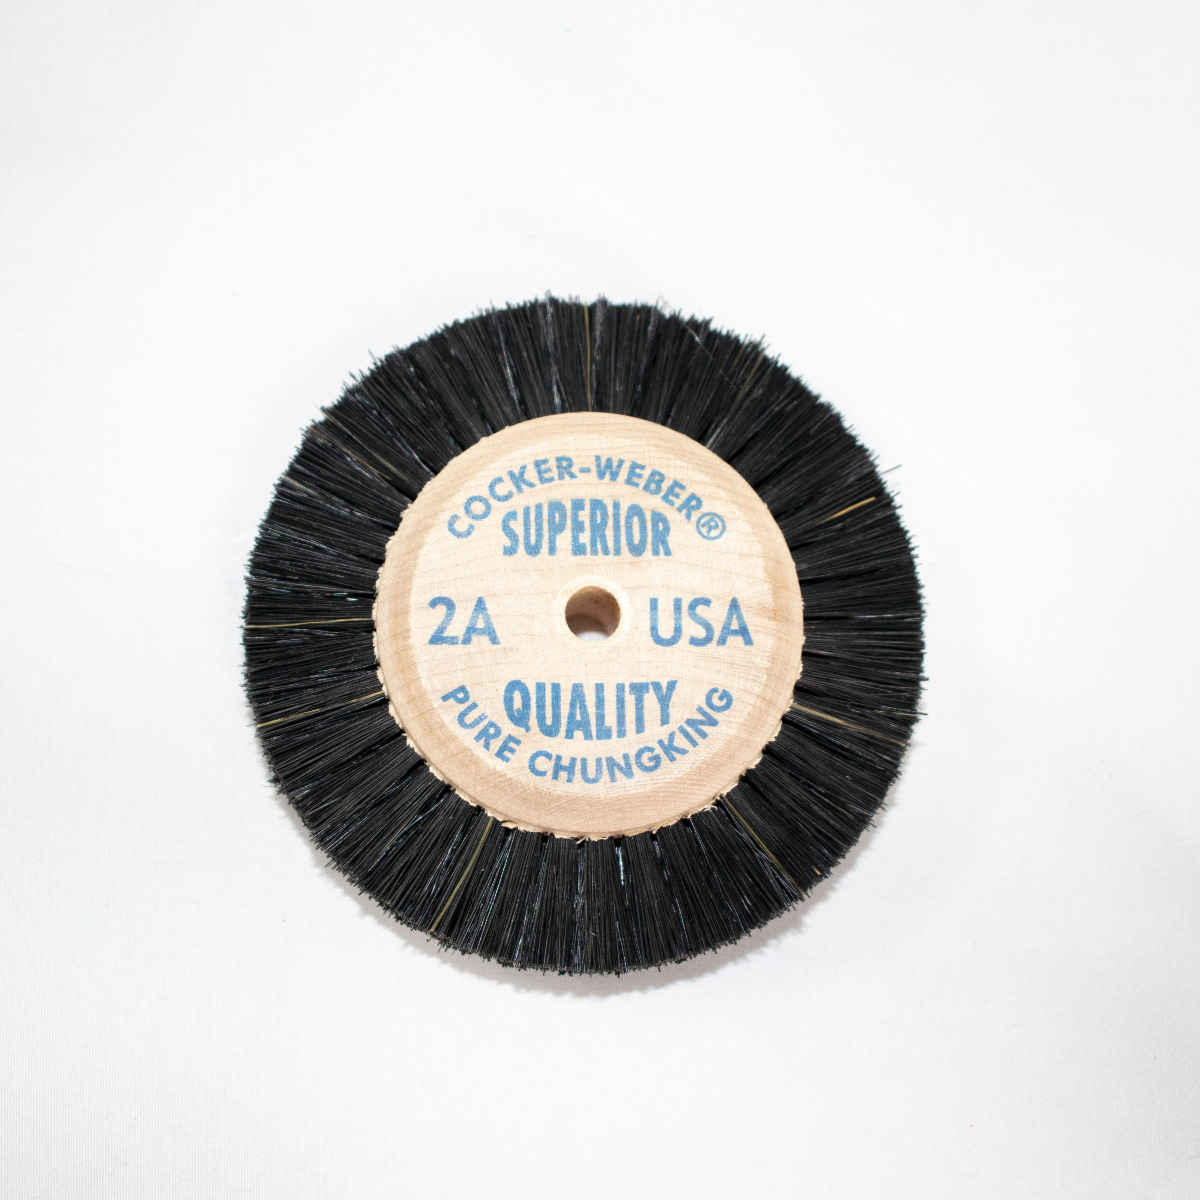 "2A Blue Label Cocker Weber Brushes, 5/8"" Trim Hair"